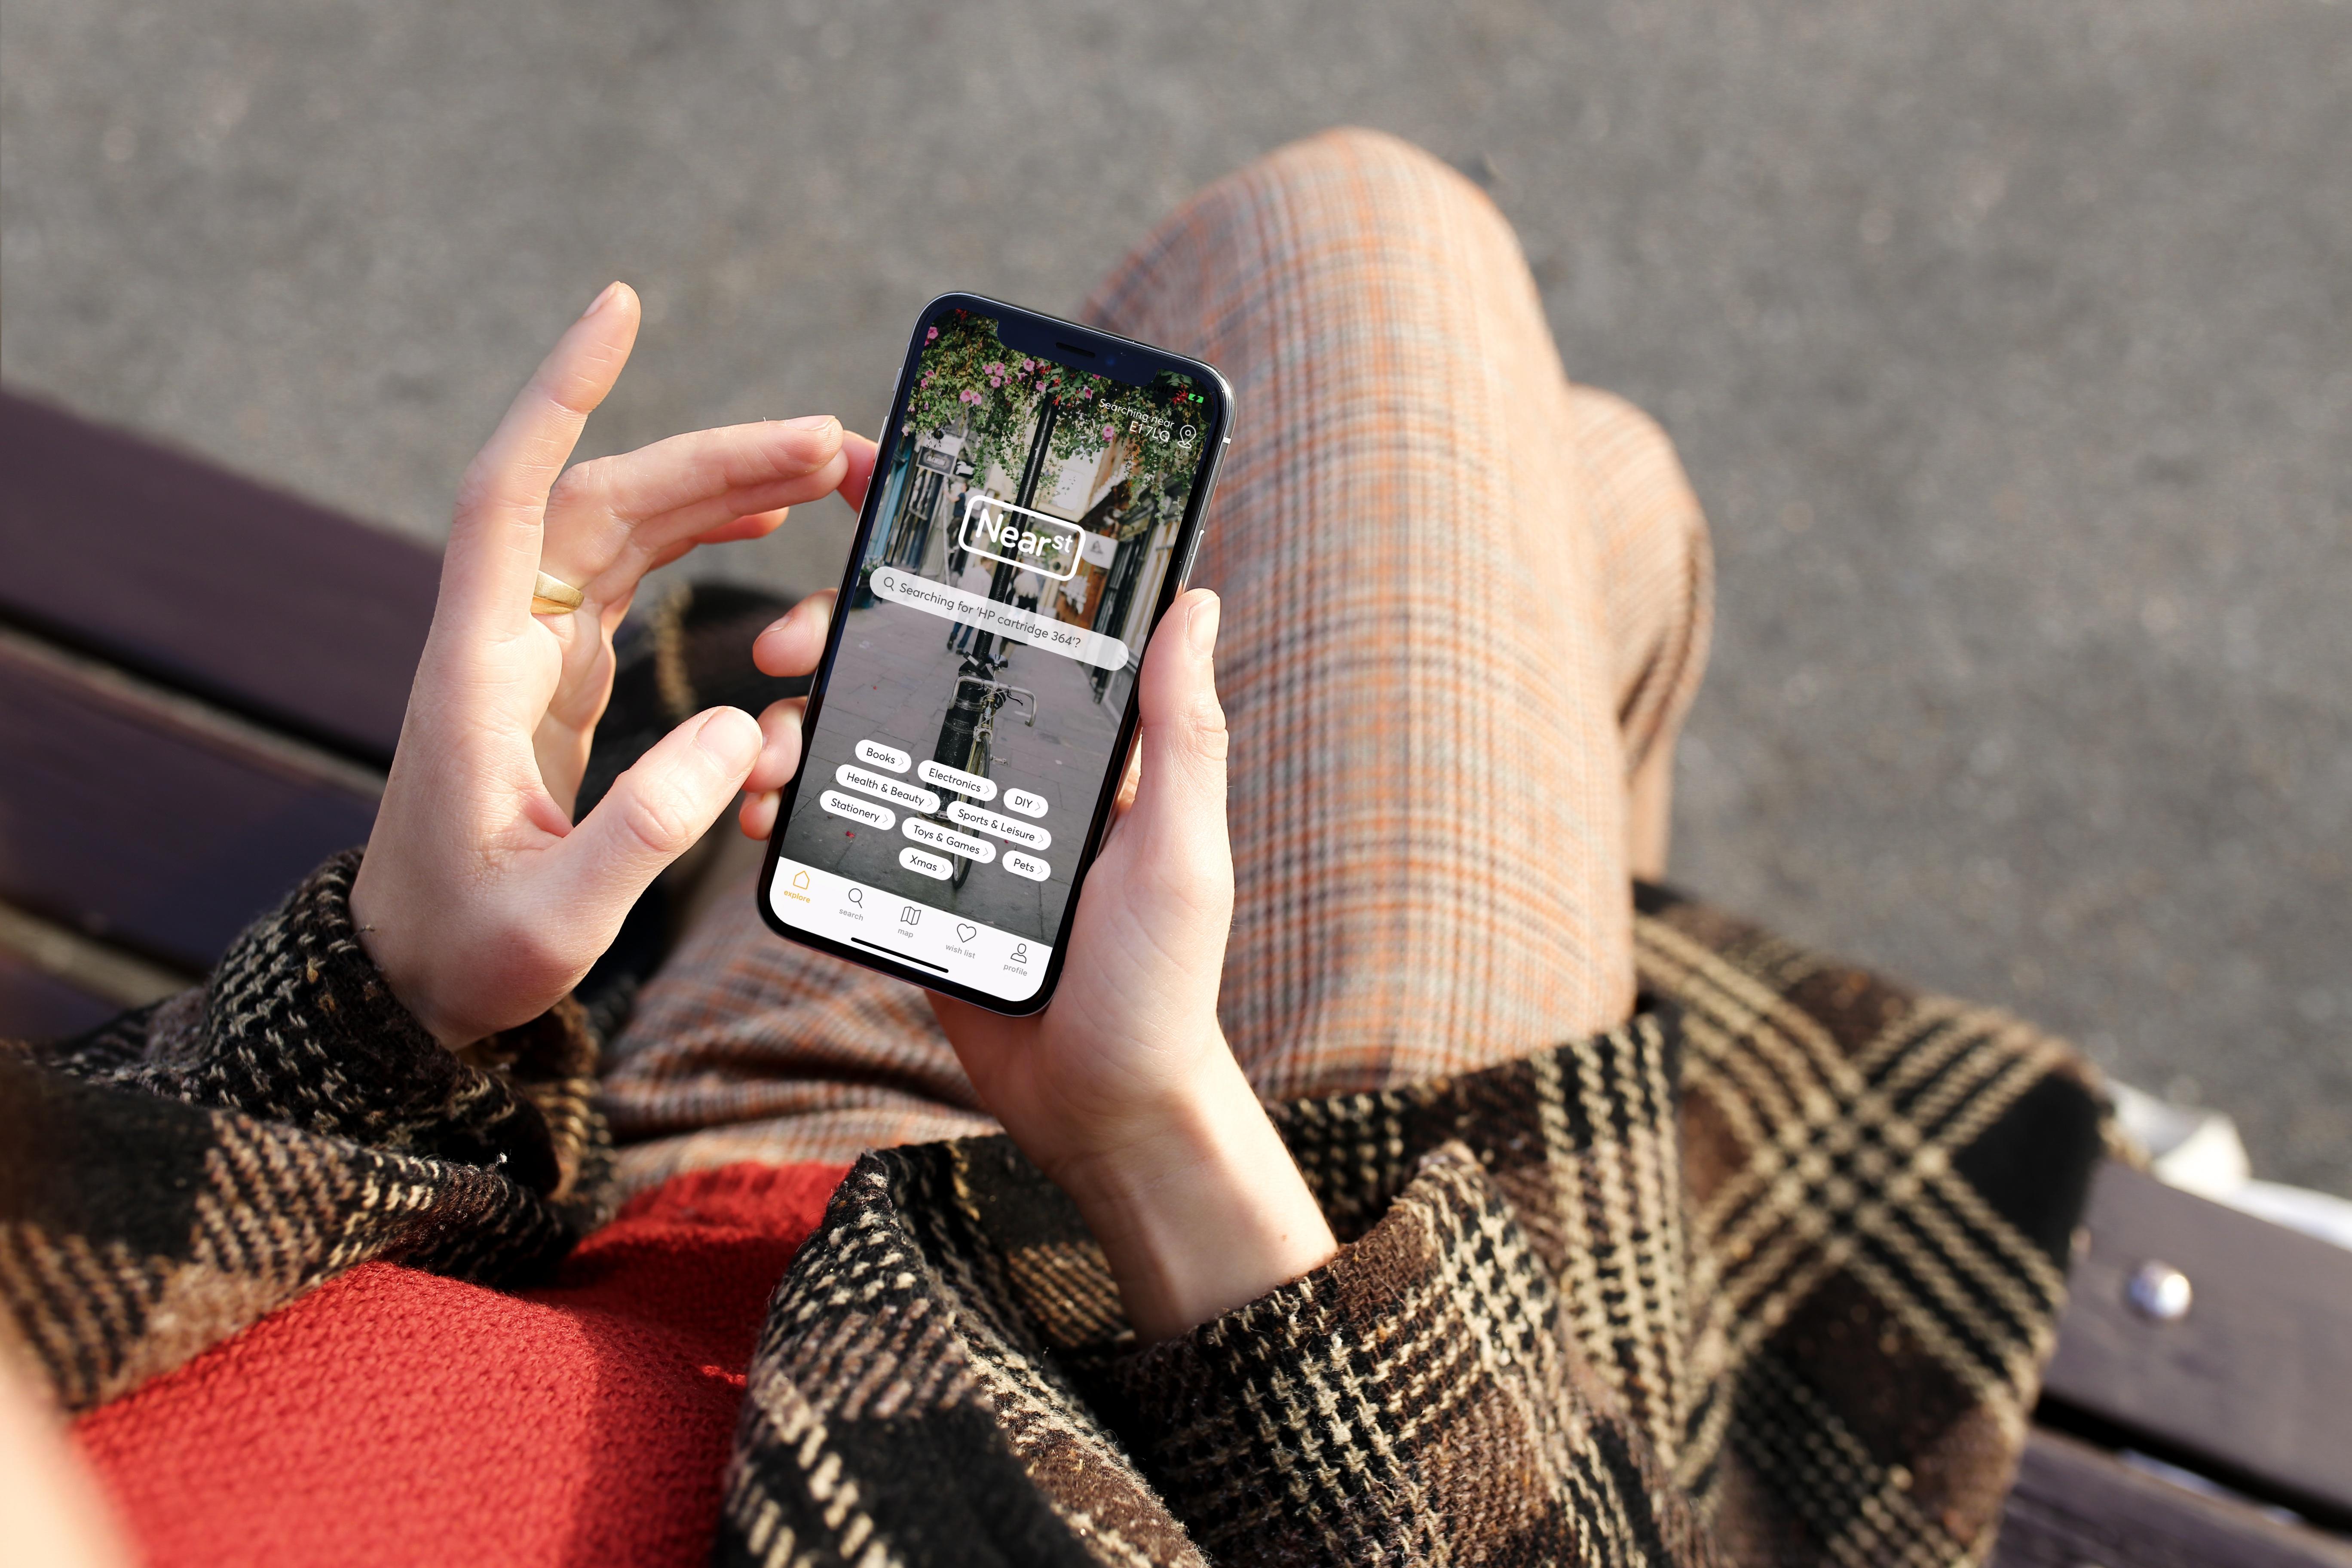 NearSt-iPhoneX-App-Home2 (1)